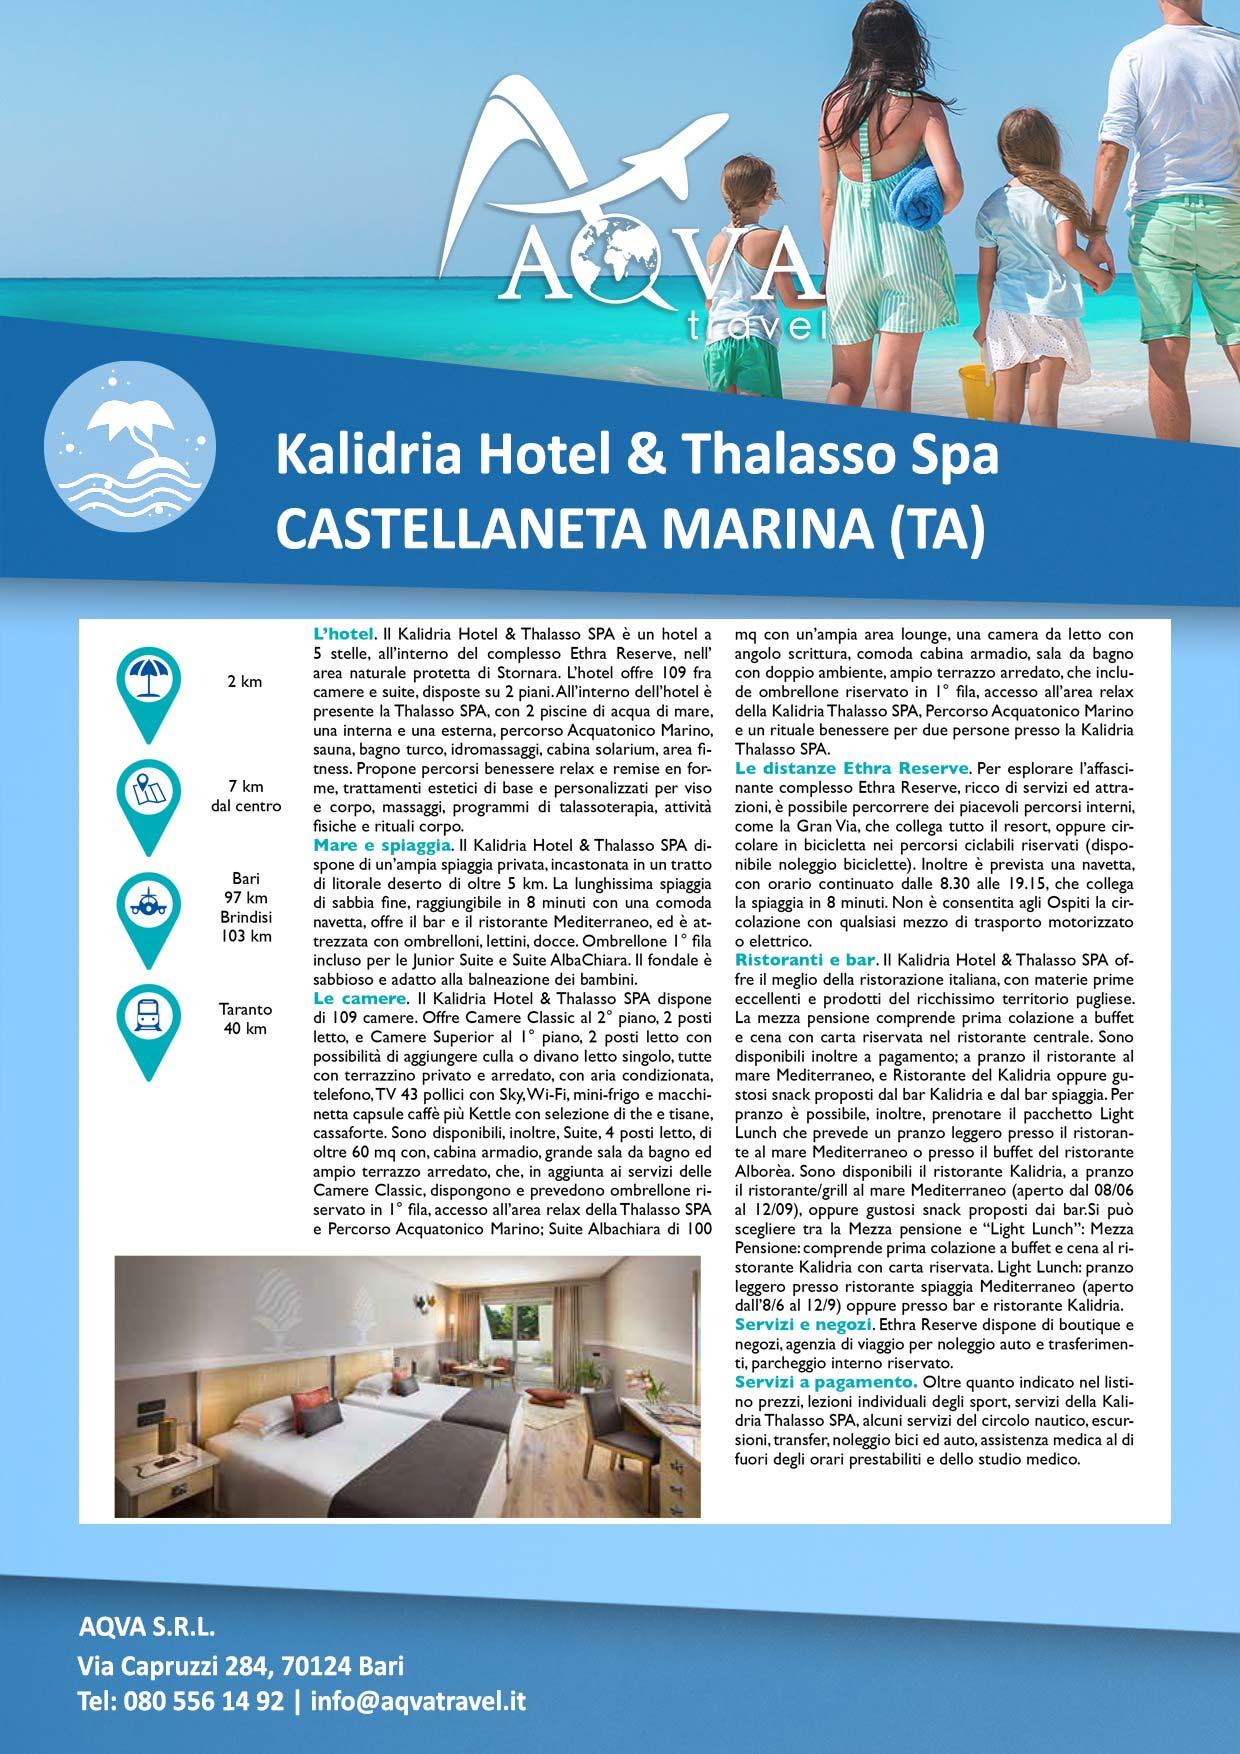 Kalidria-Hotel-&-Thalasso-Spa-CASTELLANETA-MARINA-(TA)-Mare-offerte-agenzia-di-viaggi-Bari-AQVATRAVEL-it